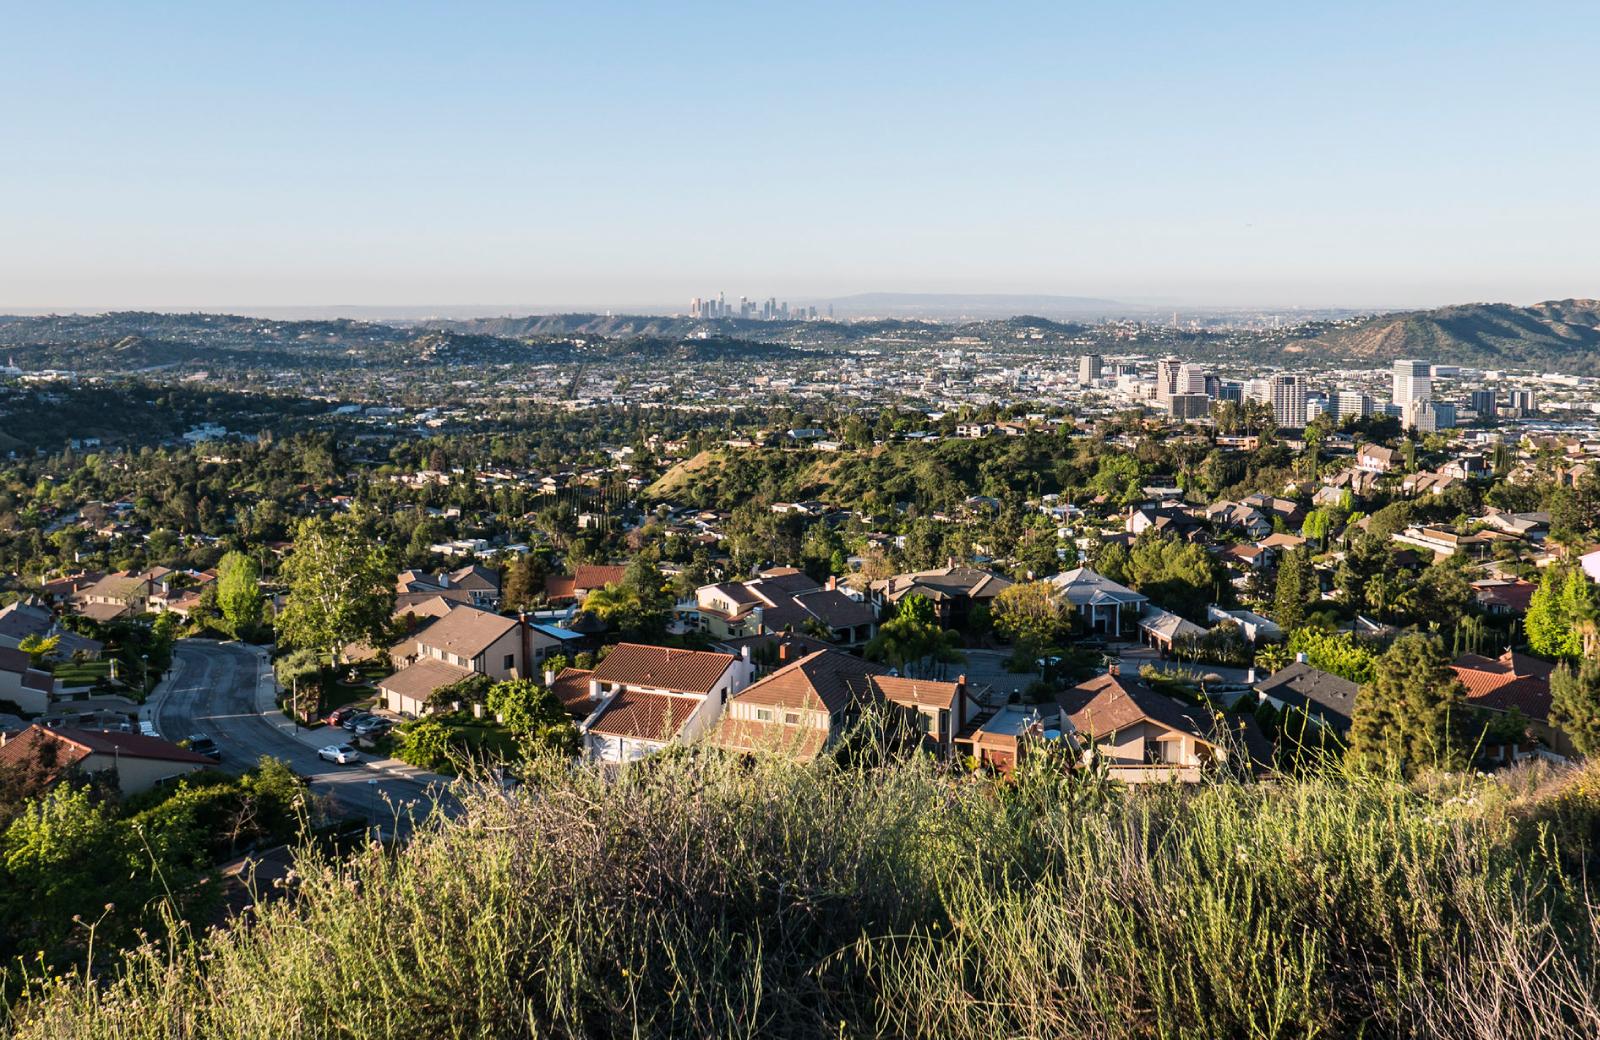 Glendale Community - Altana Apts